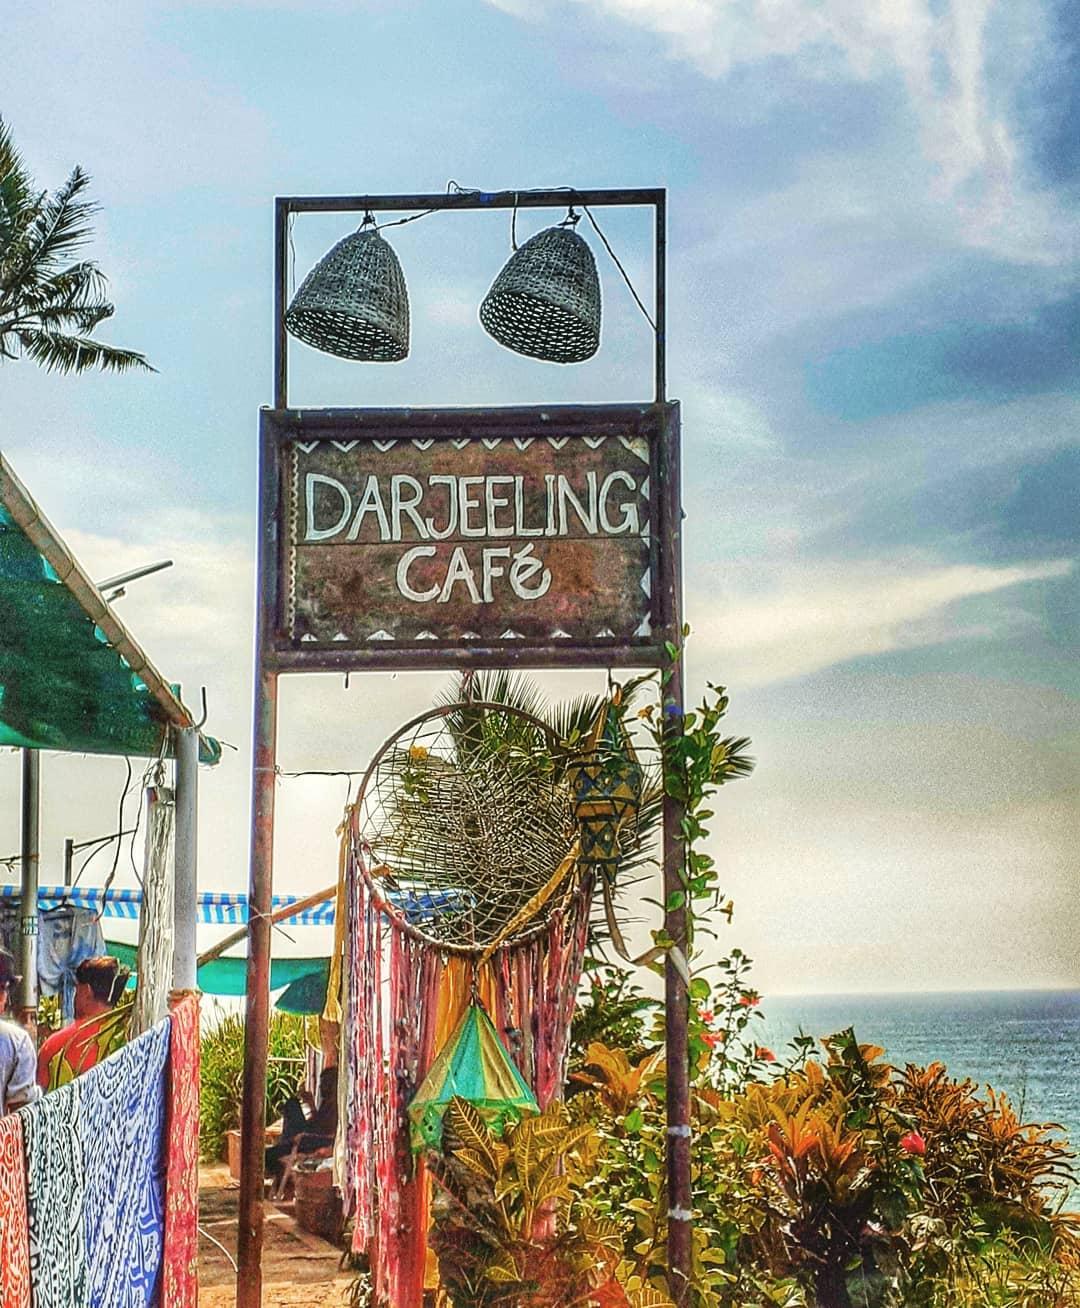 Darjeeling cafe Varkala